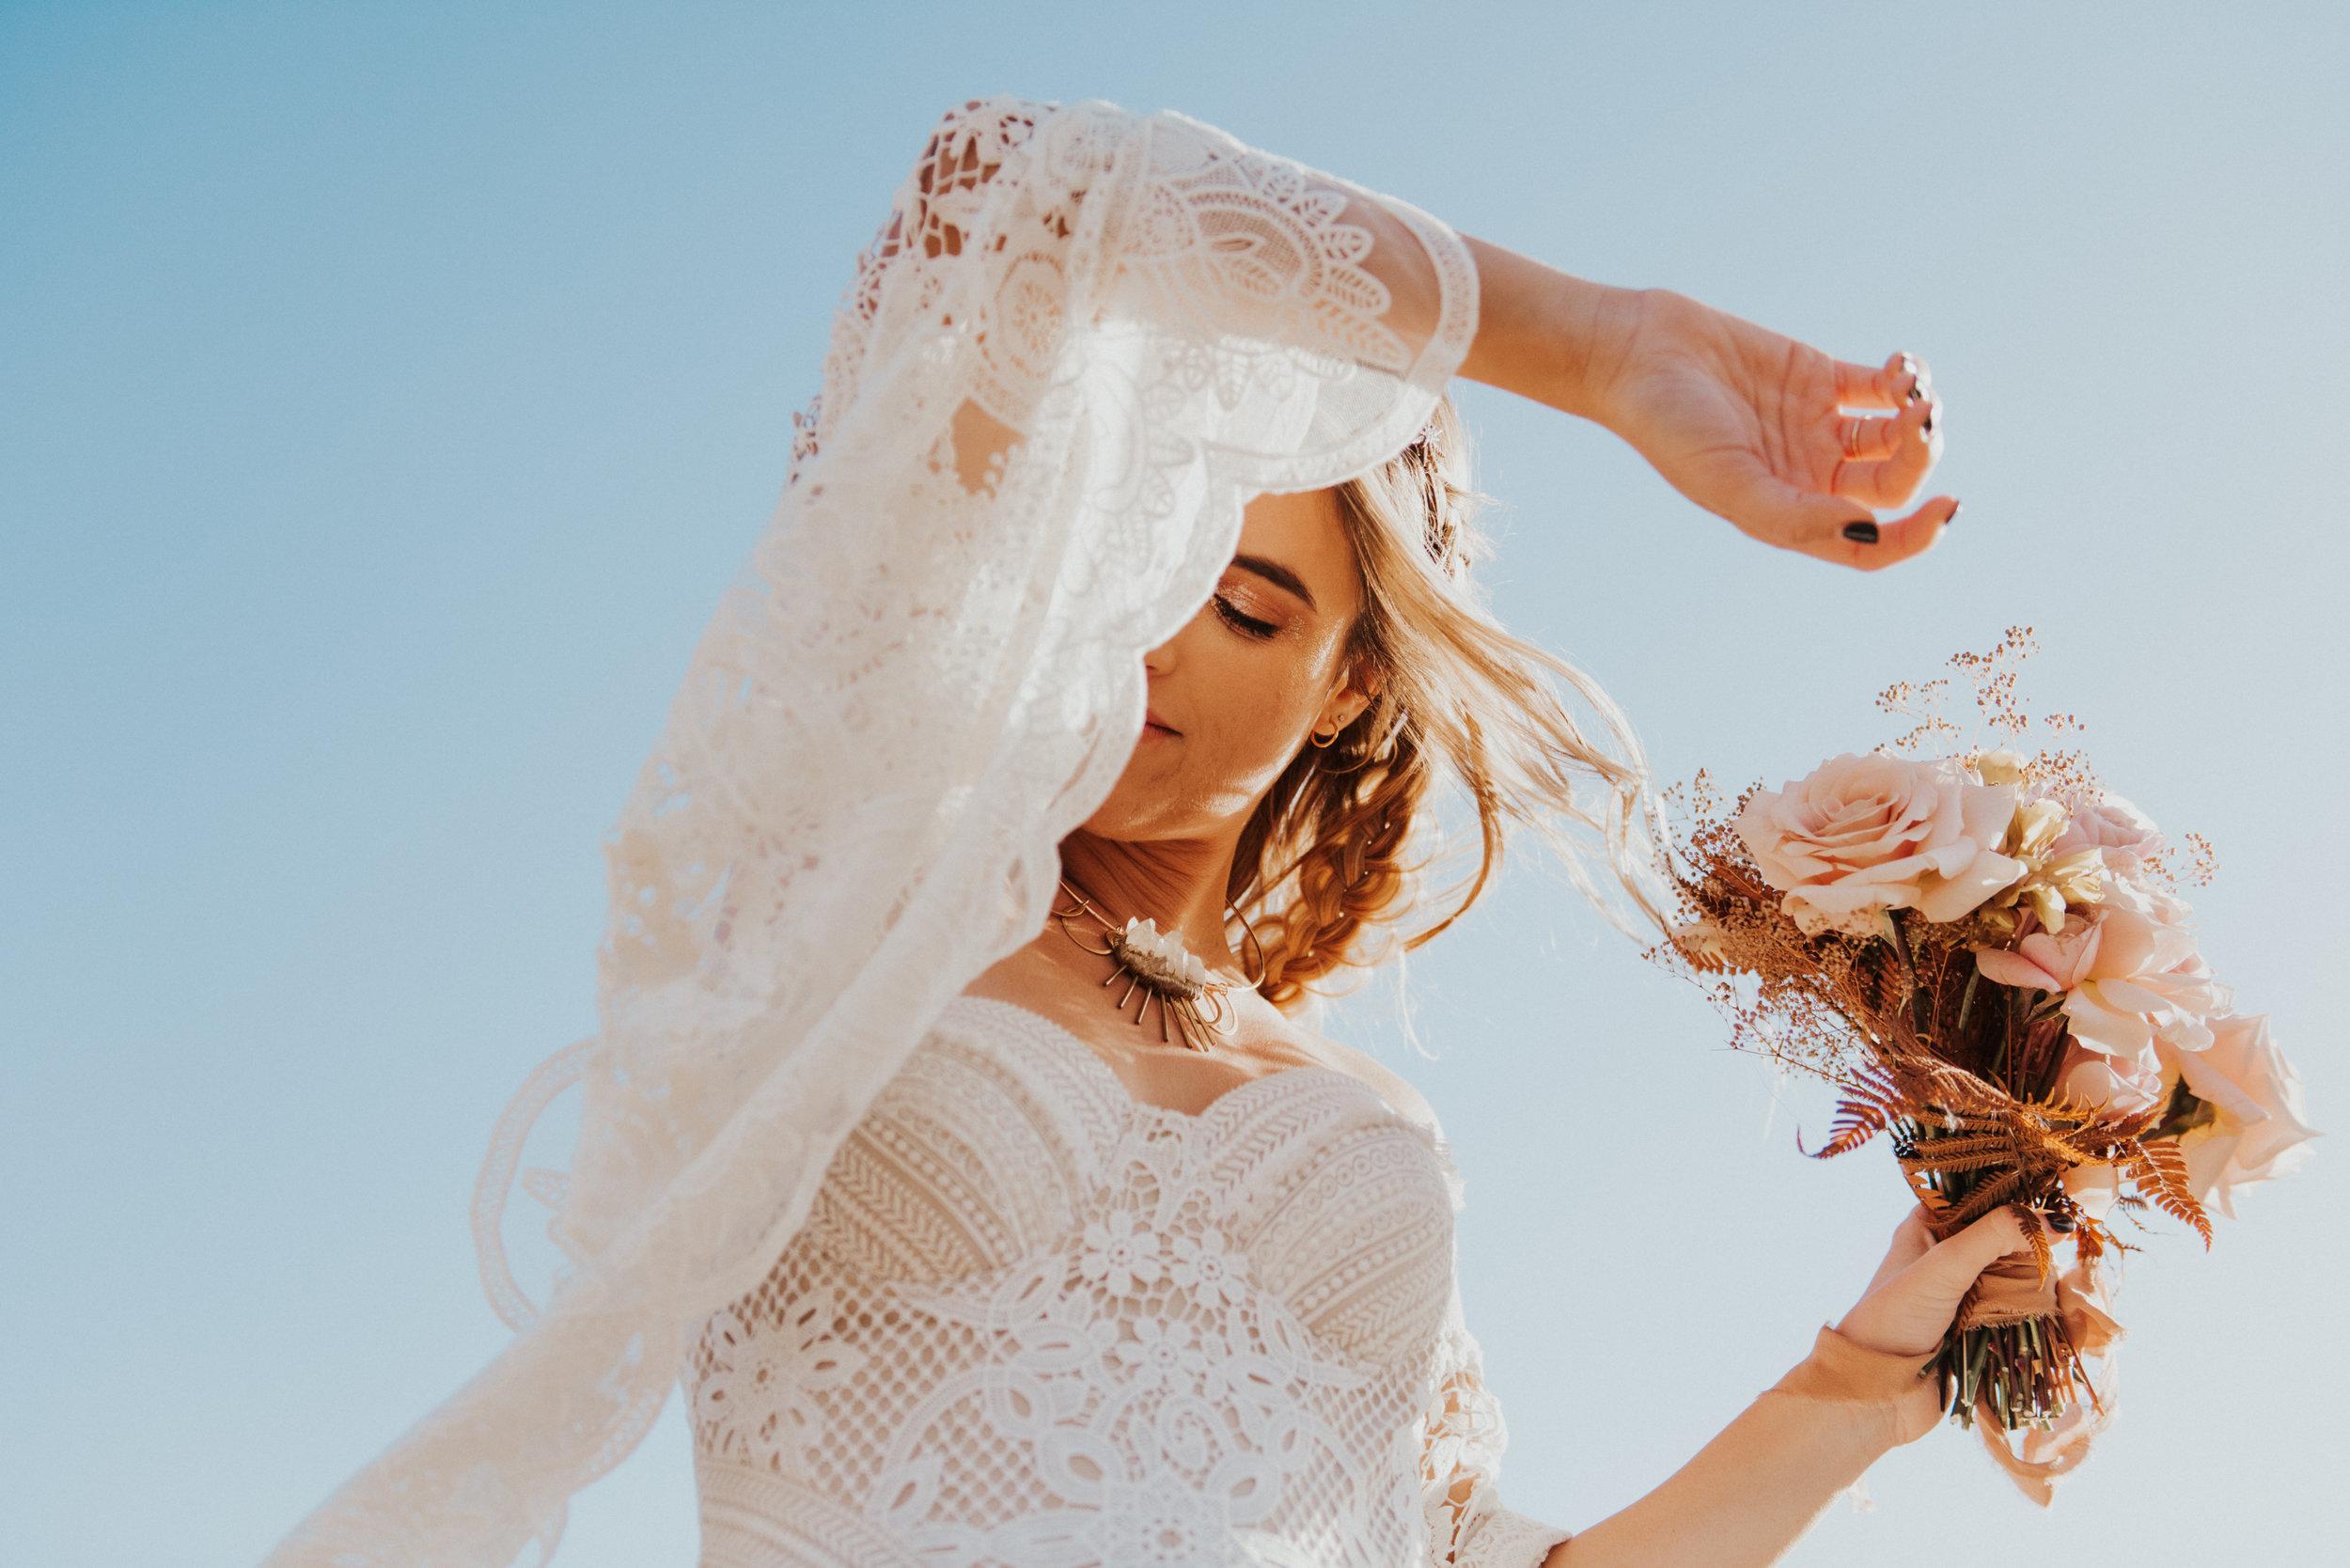 FortSt.John_photographer_TyraEPhotography_Wedding_Couple_Family_Photograhy_DawsonCreek_Elopement_Bride_Boduoir_Portraits-4949.jpg